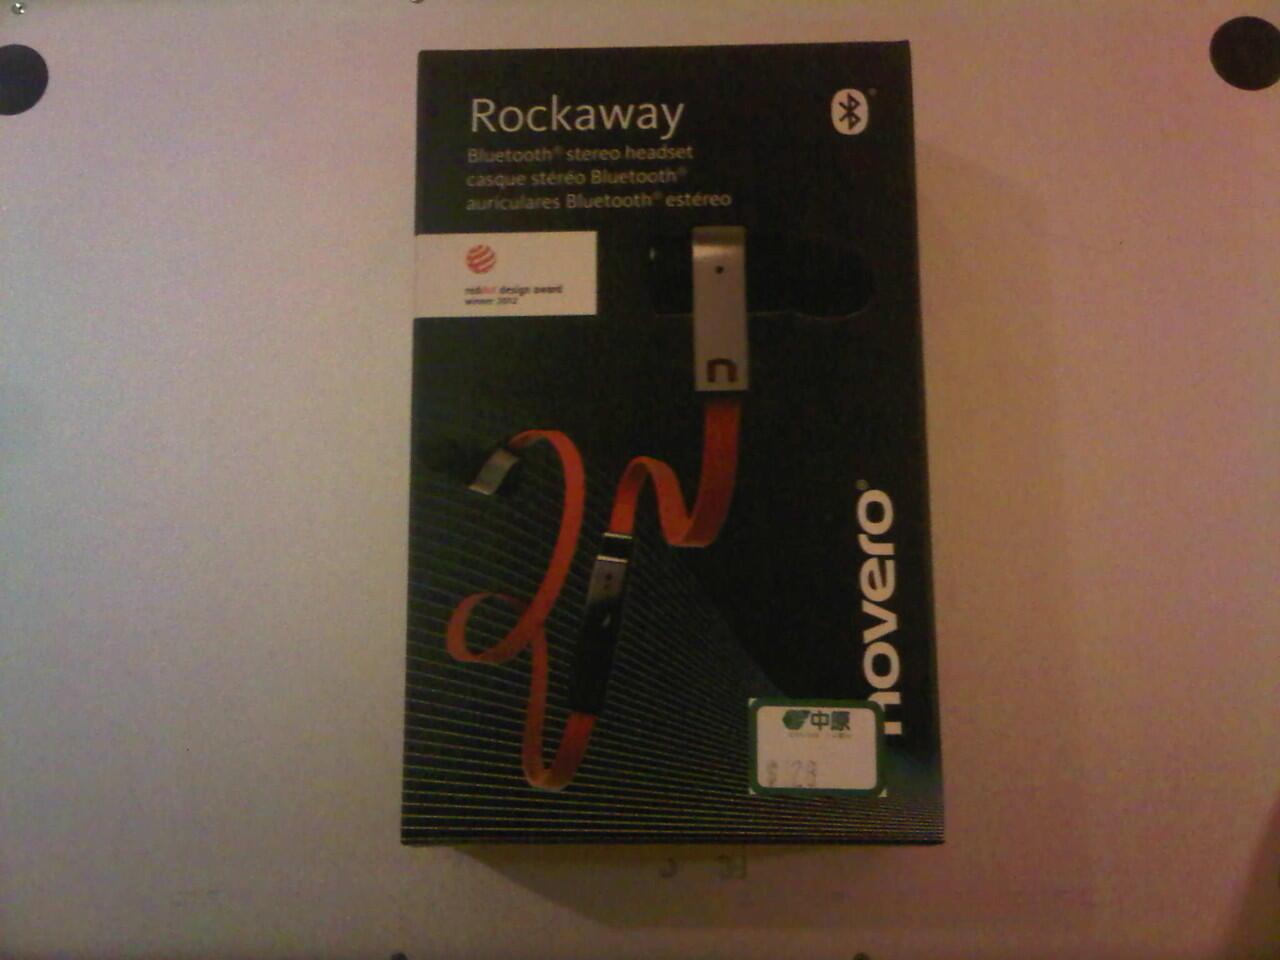 Rockaway BLUETOOTH STEREO HEADSET